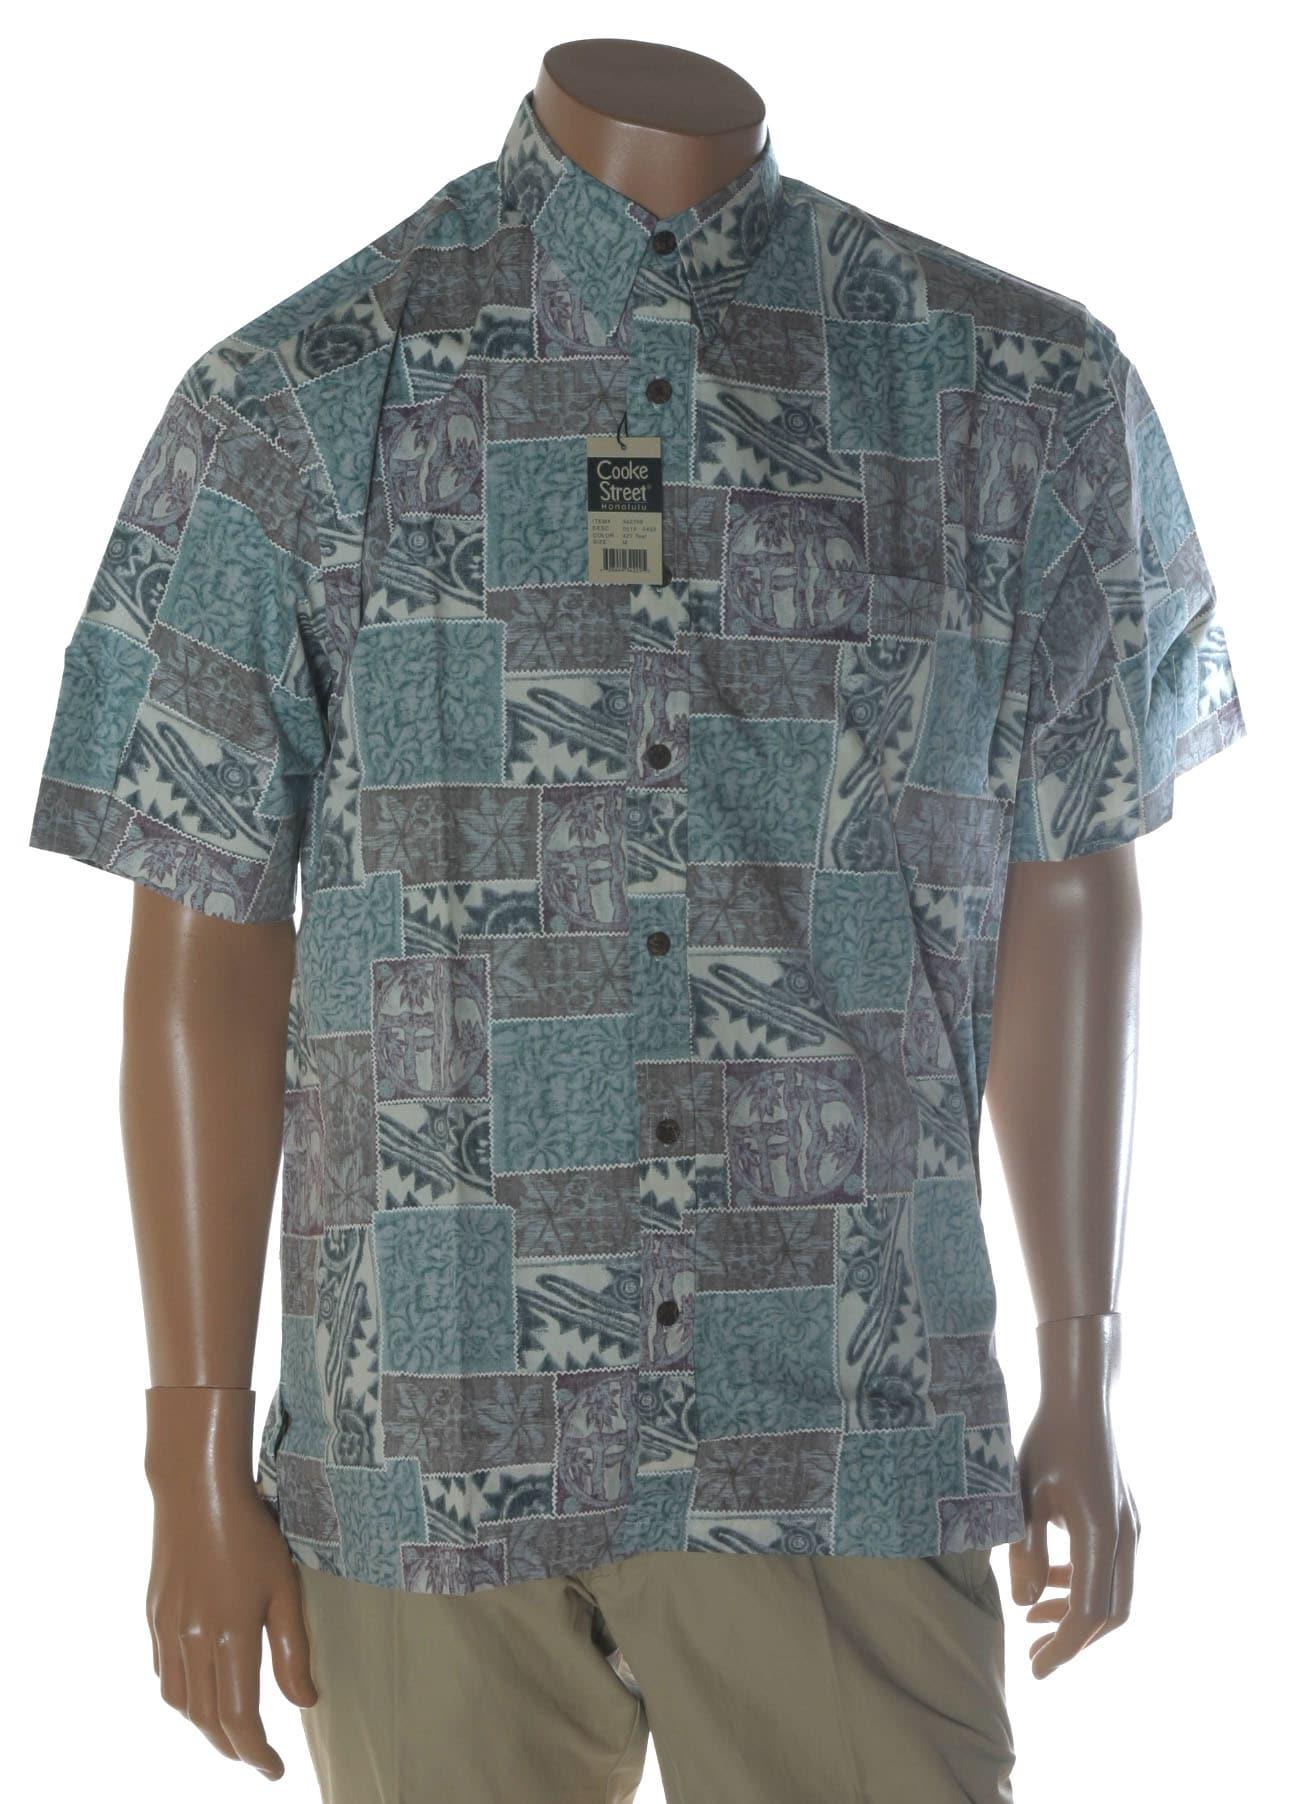 ae3e7533 Shop Cooke Street Honolulu Mens Hawaiian Shirt - Free Shipping On Orders  Over $45 - Overstock - 4032484